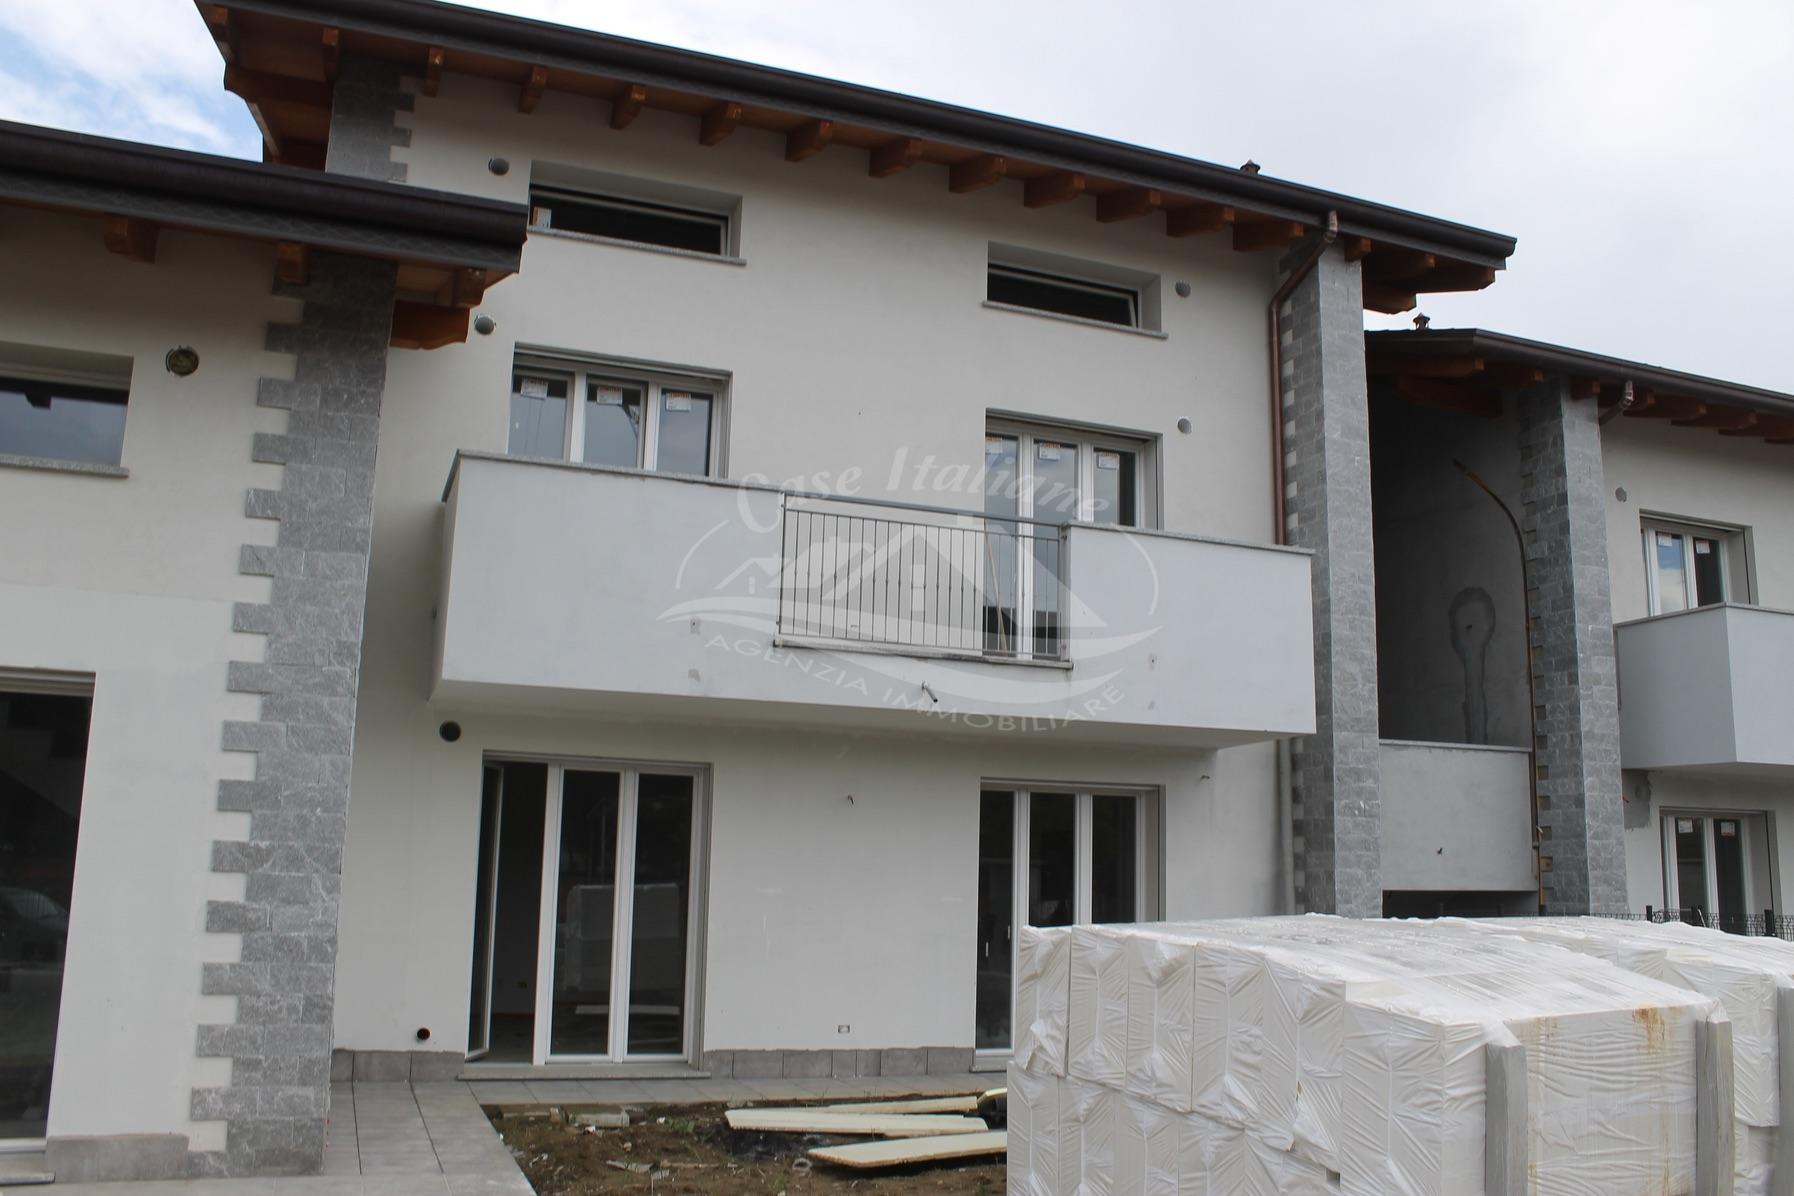 Appartamento di 4 locali con mansarda a Cantu'